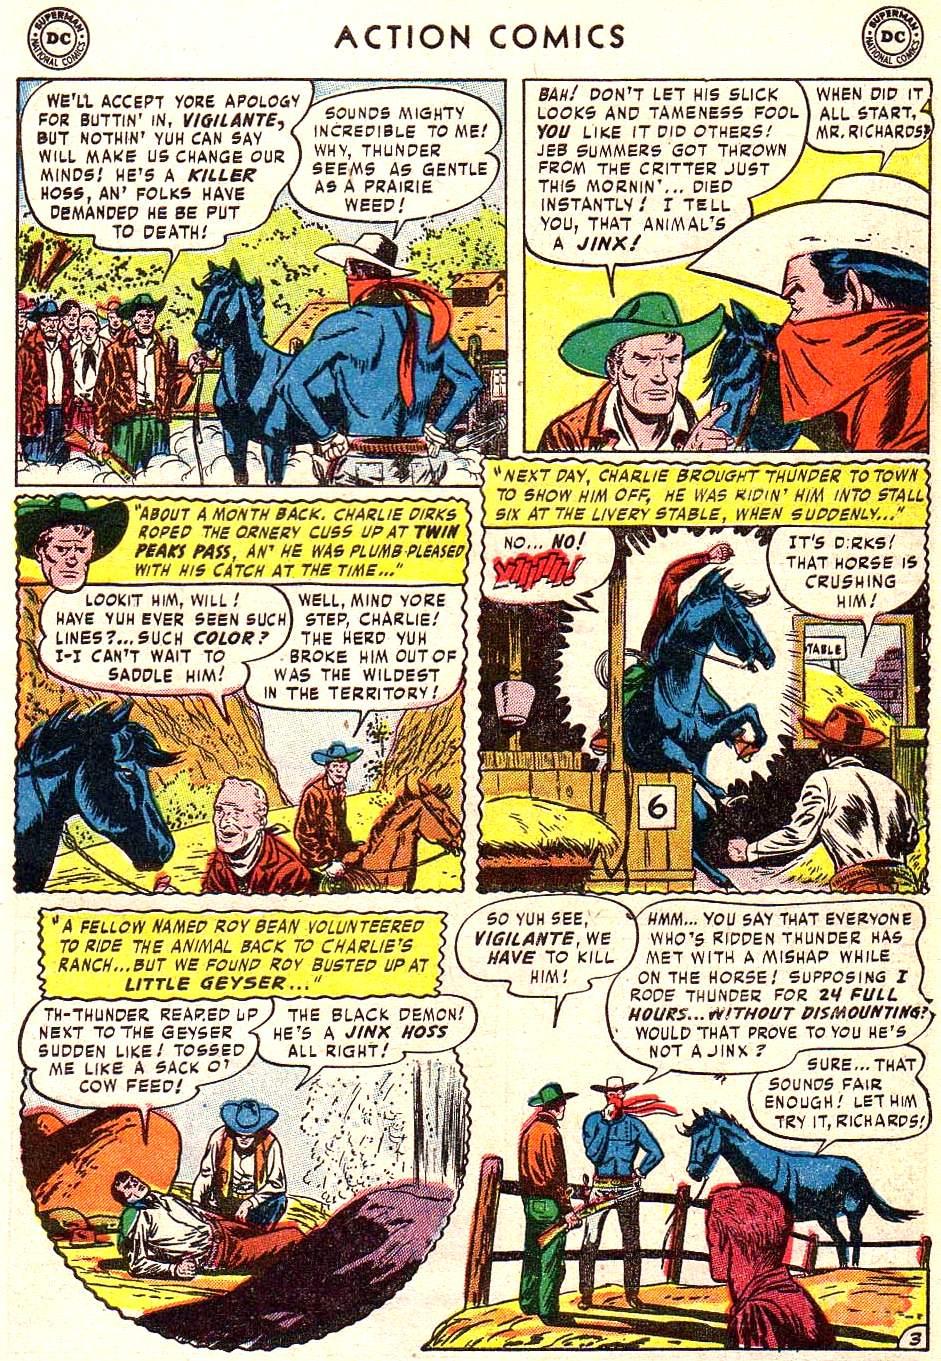 Action Comics (1938) 172 Page 36